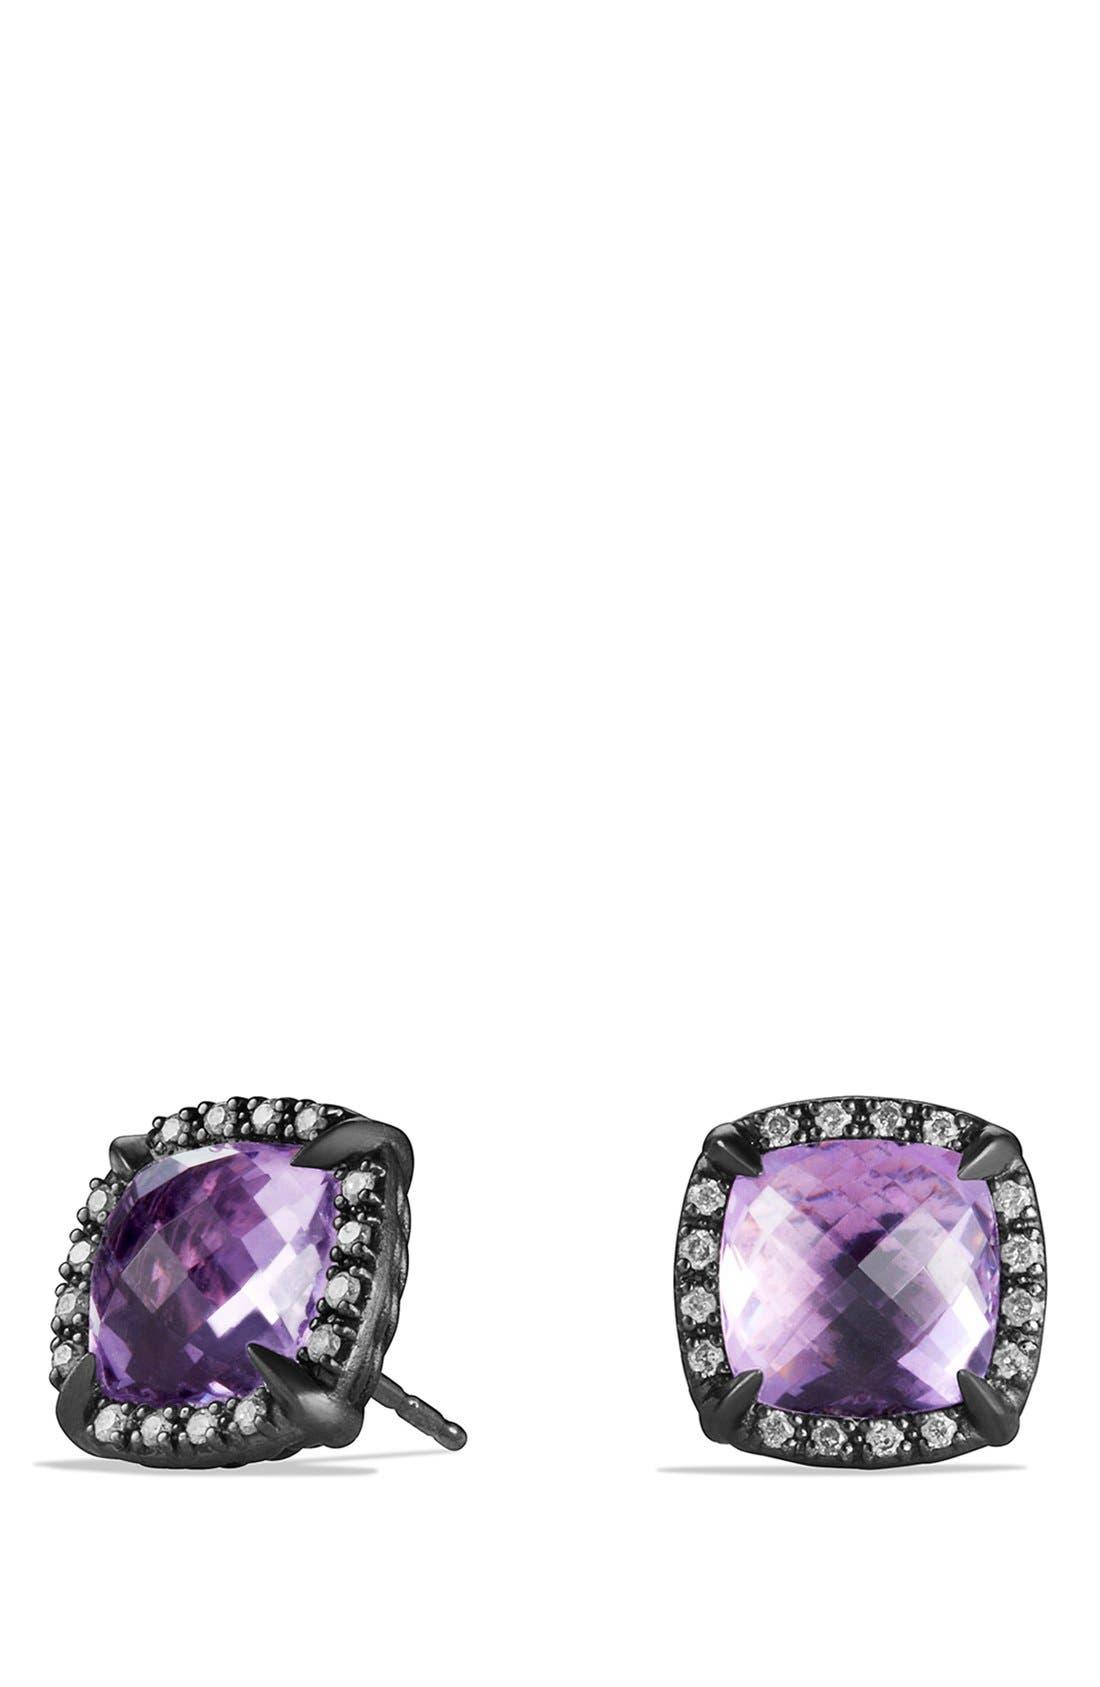 DAVID YURMAN Châtelaine Earrings with Semiprecious Stone and Diamonds